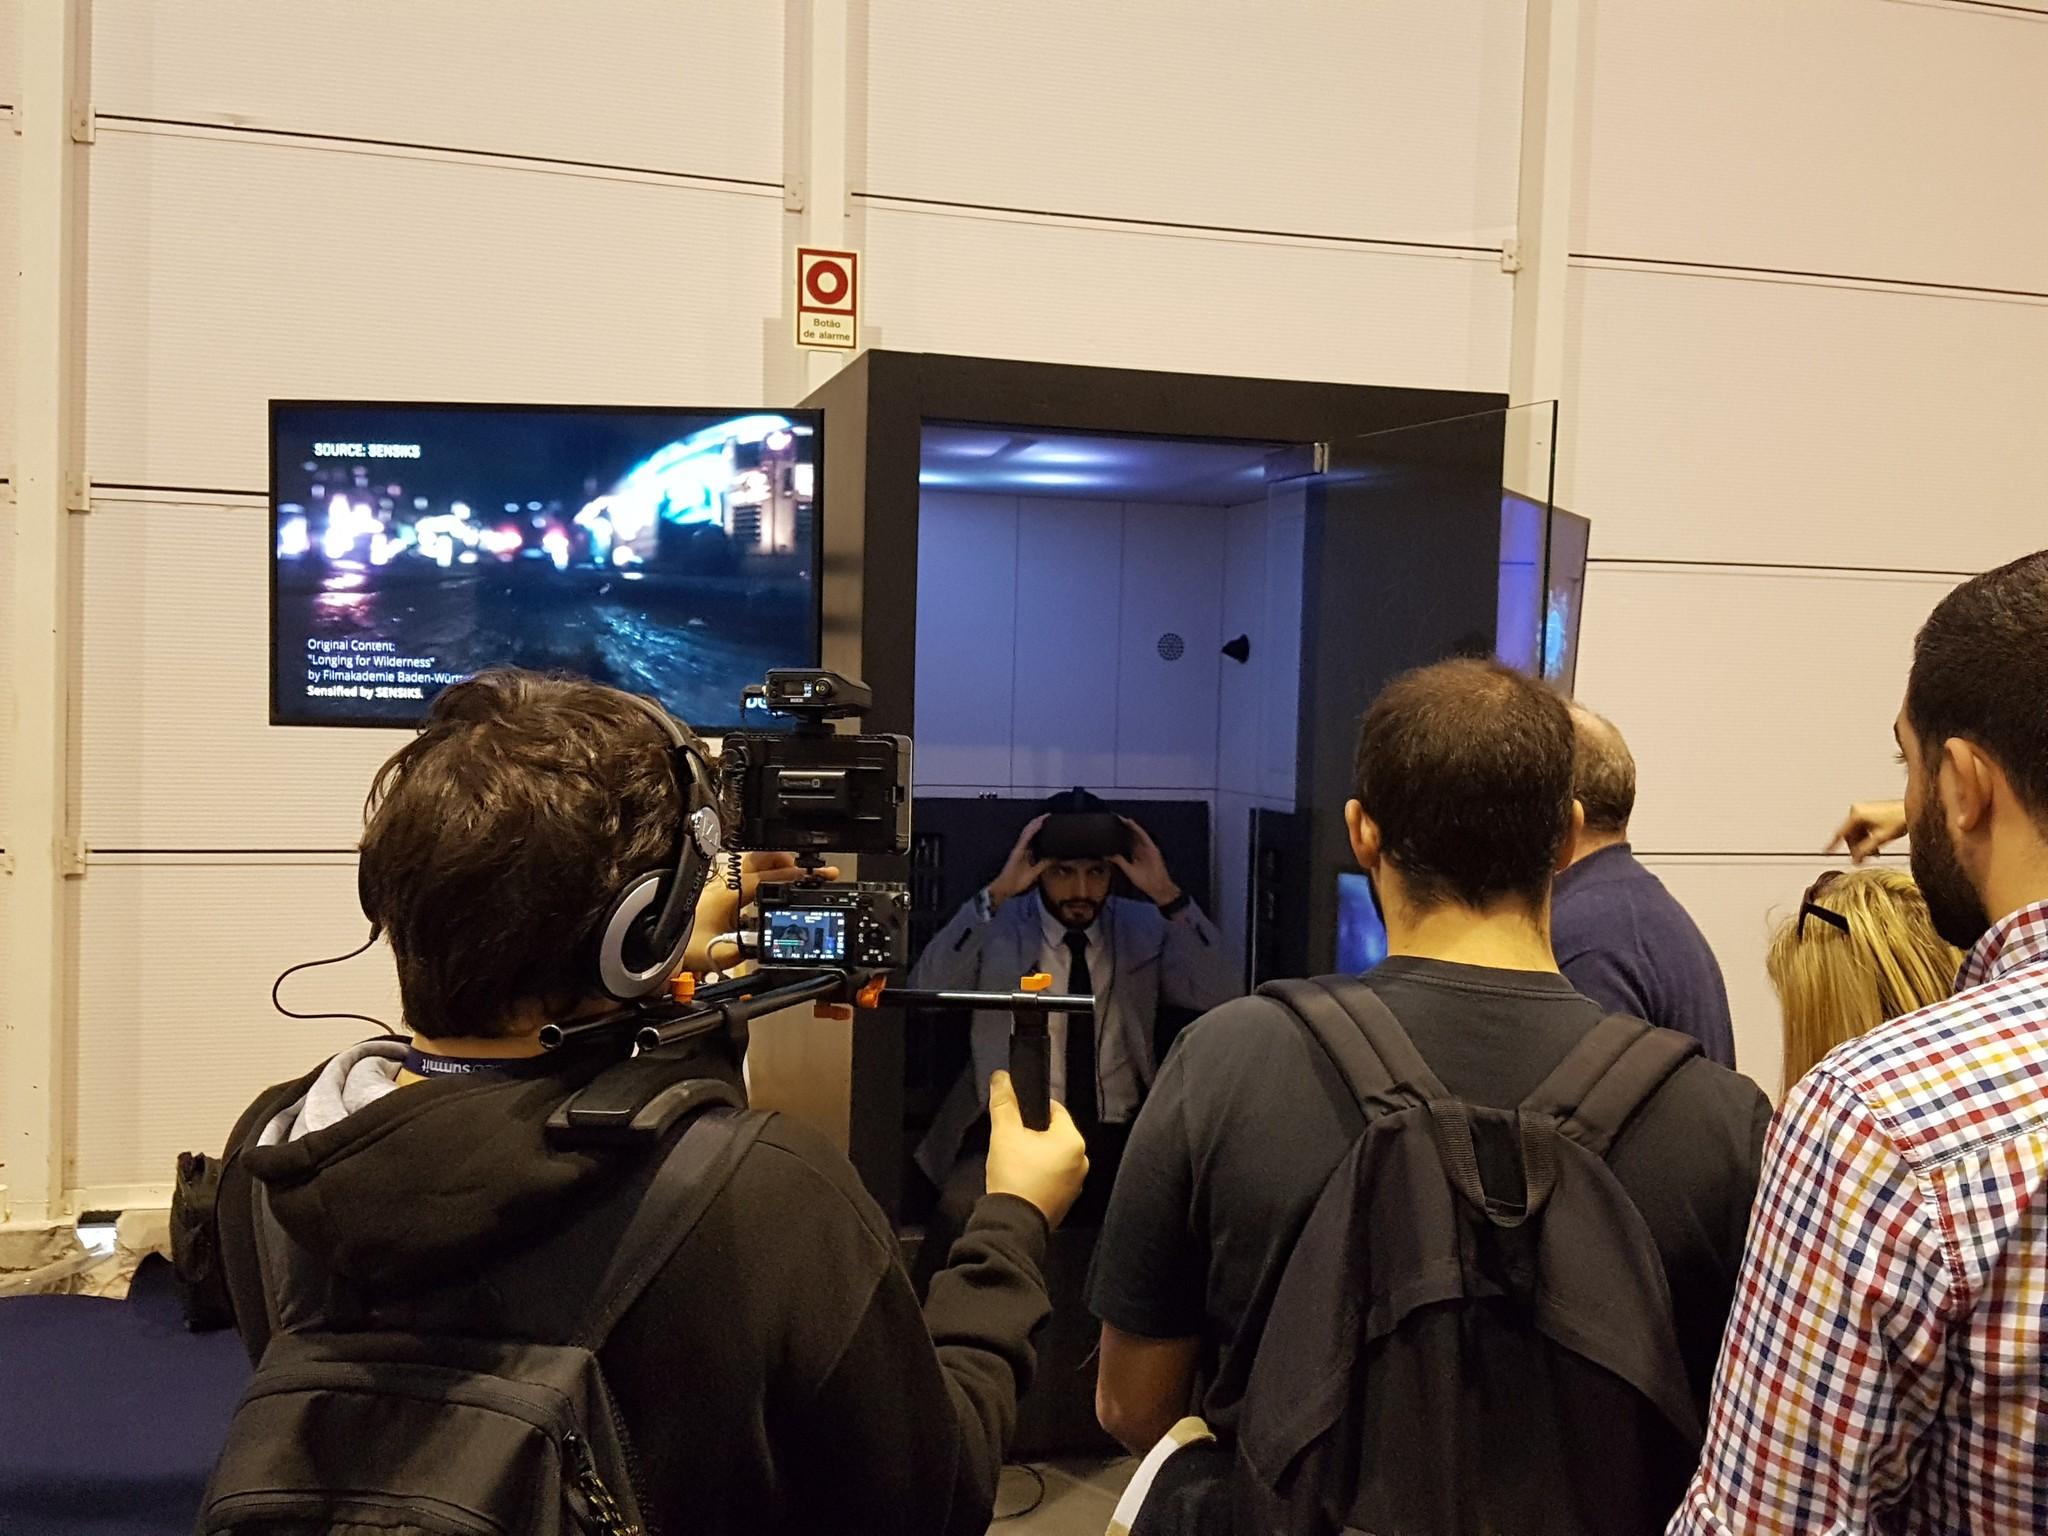 websummit virtual reality augmented reality sensiks event 4